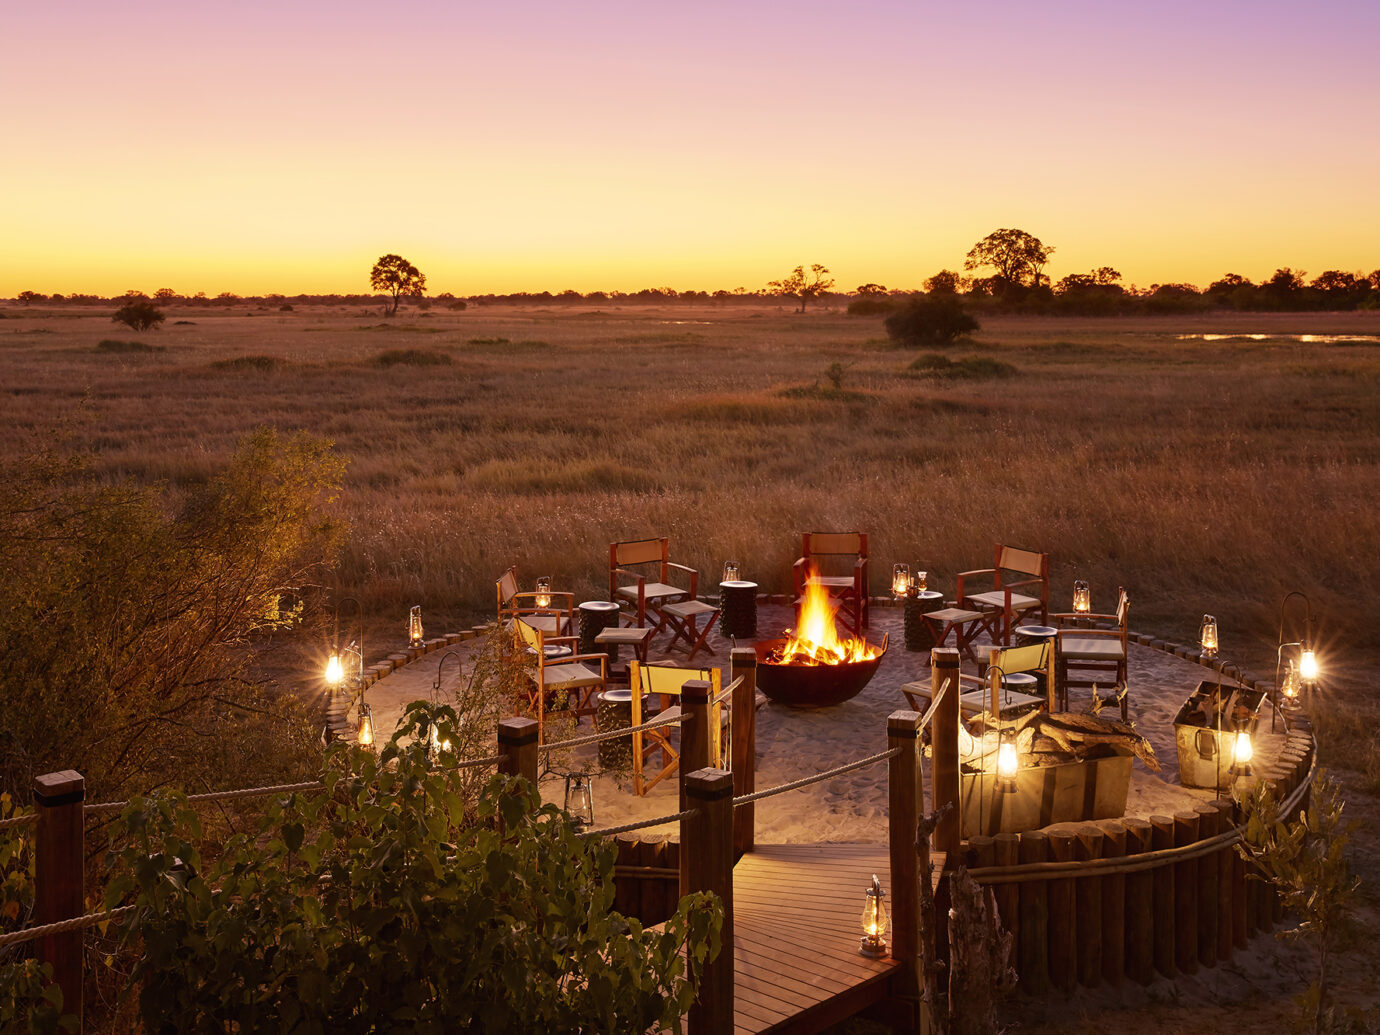 Fire pit at Tuludi Camp, Botswana